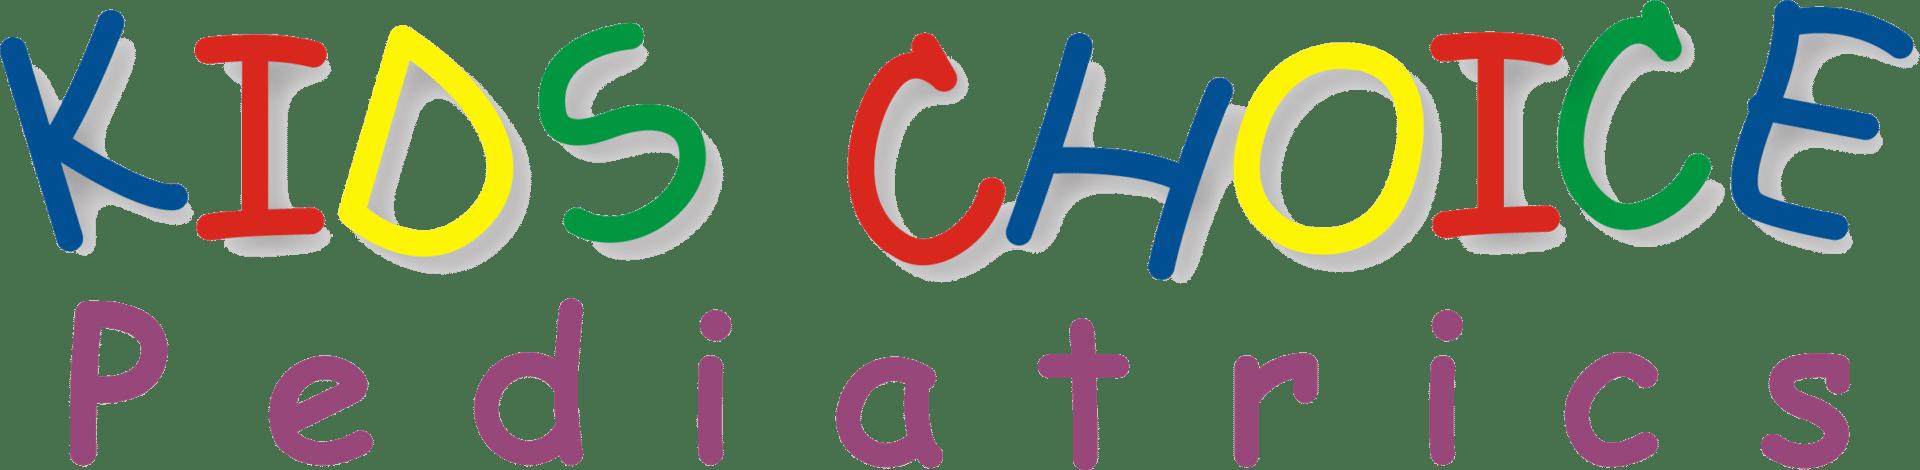 KidsChoice High Resolution